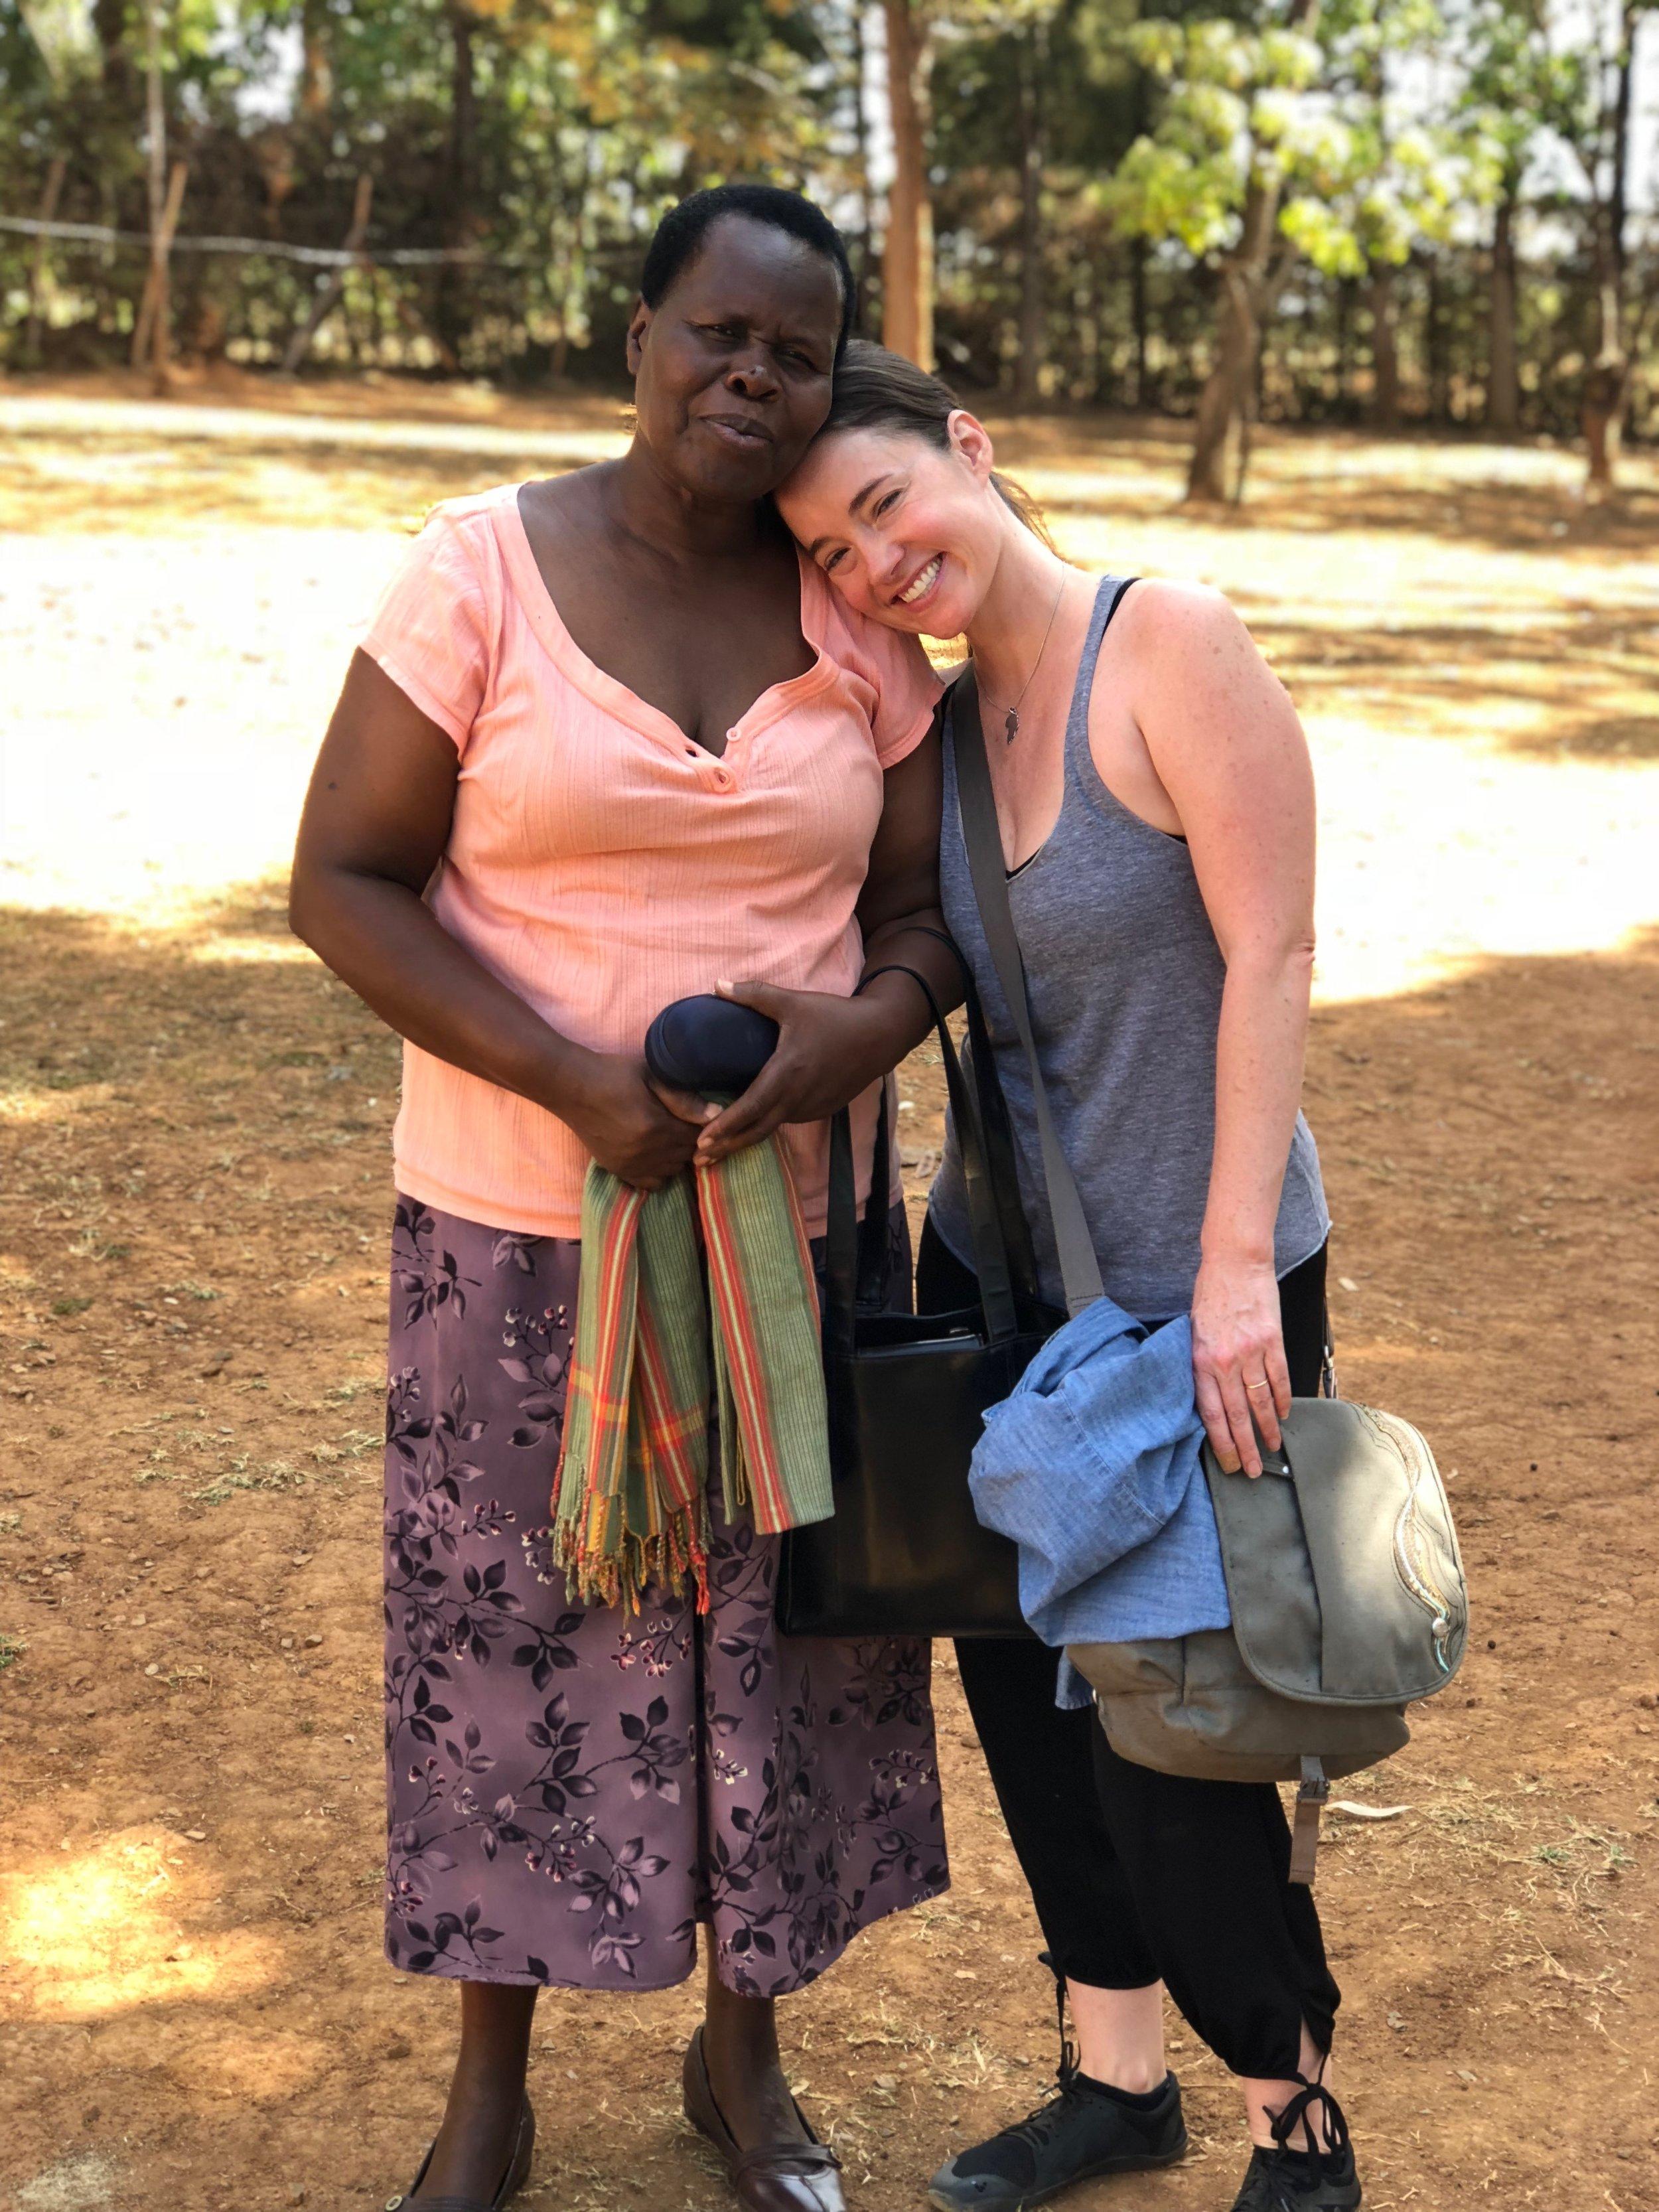 Juanita Opot & Sarah Fennel Buchanan, Co-Founders of the JCO Children's Home